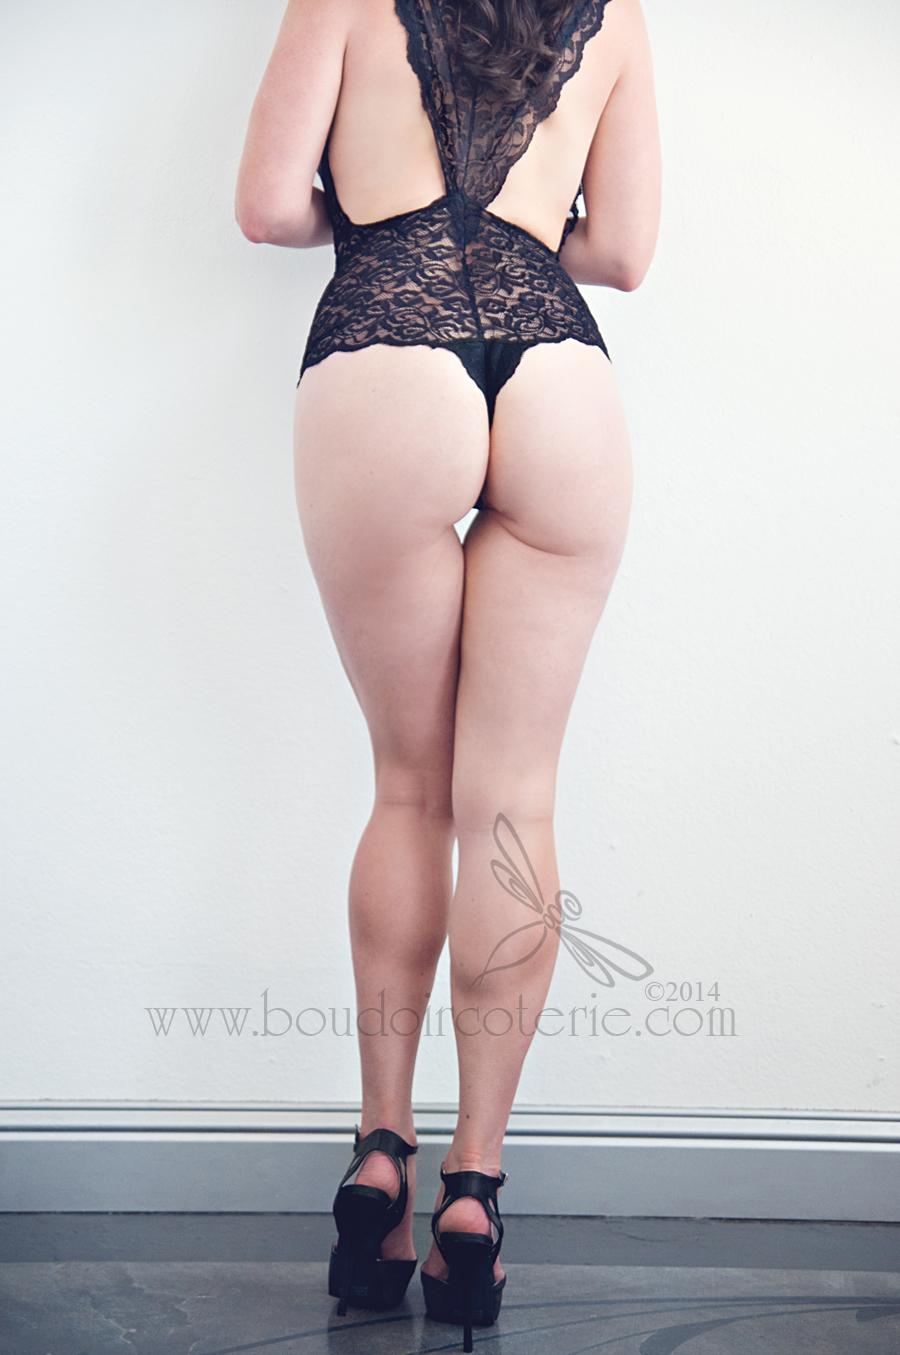 3 hot russian girls getting fucked 3